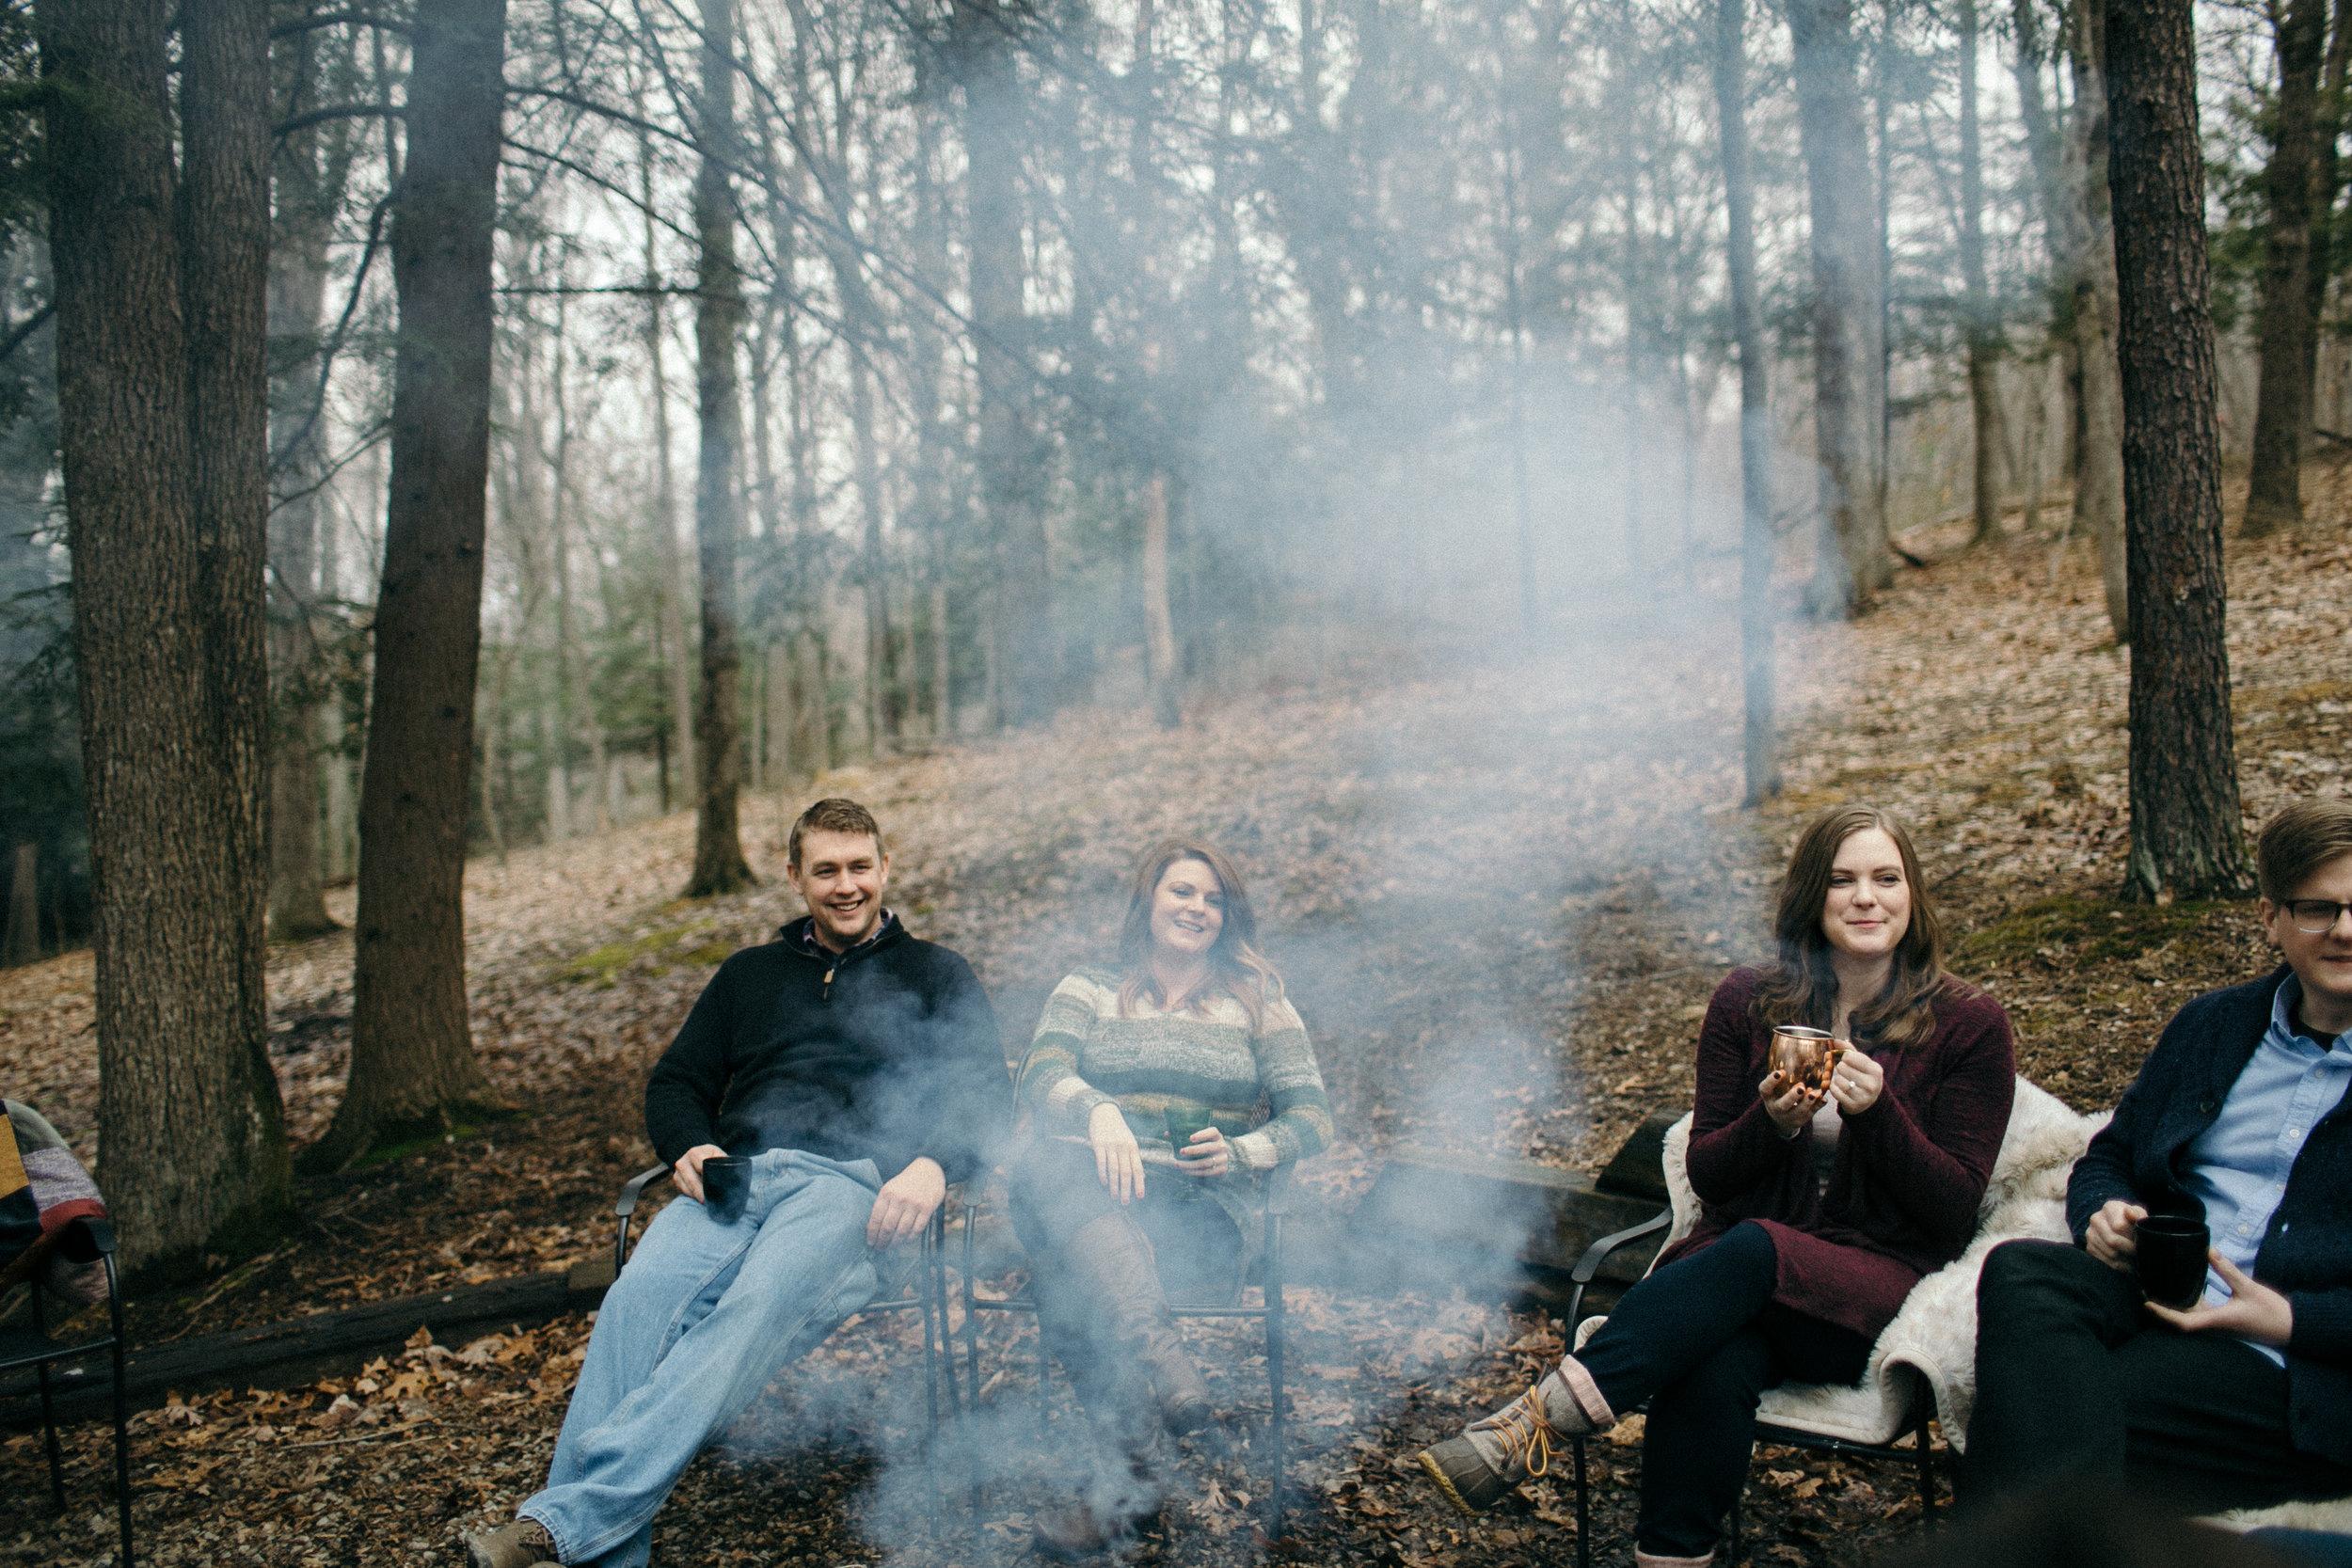 jake and krysti columbus ohio engagement photography by sarah rose